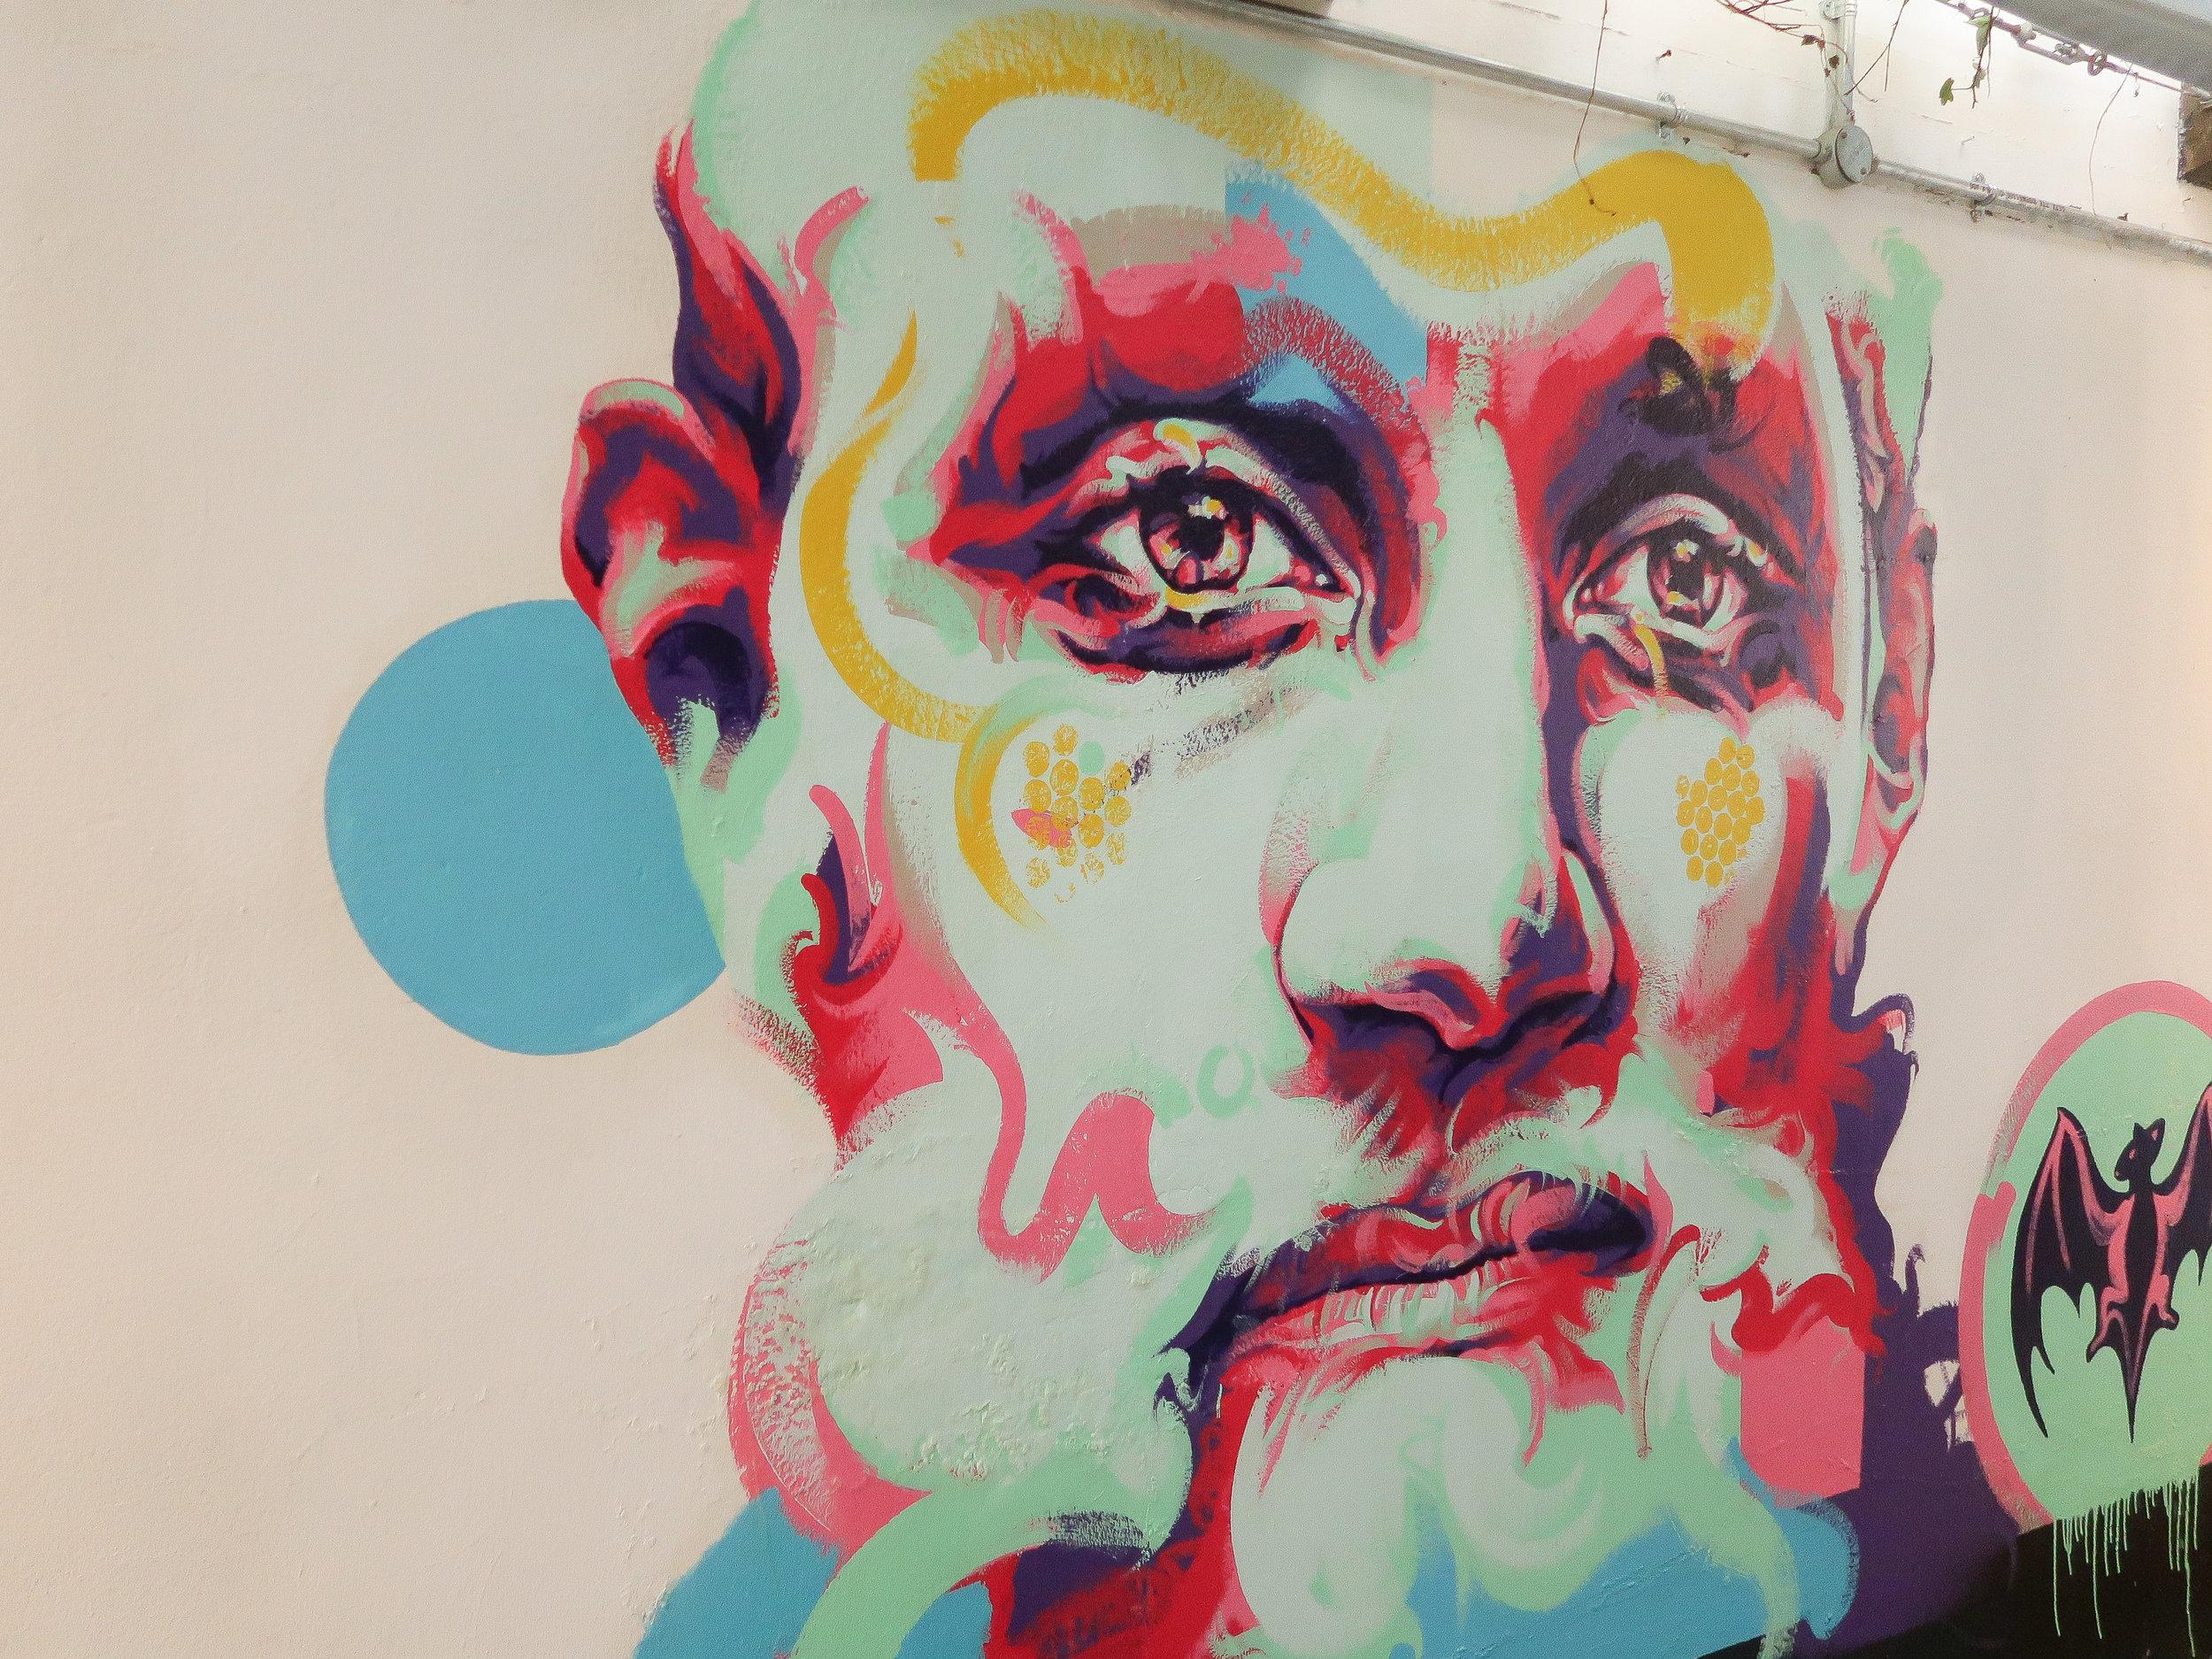 MichaelCorr_CandyBar_Mural (4 of 14).jpg